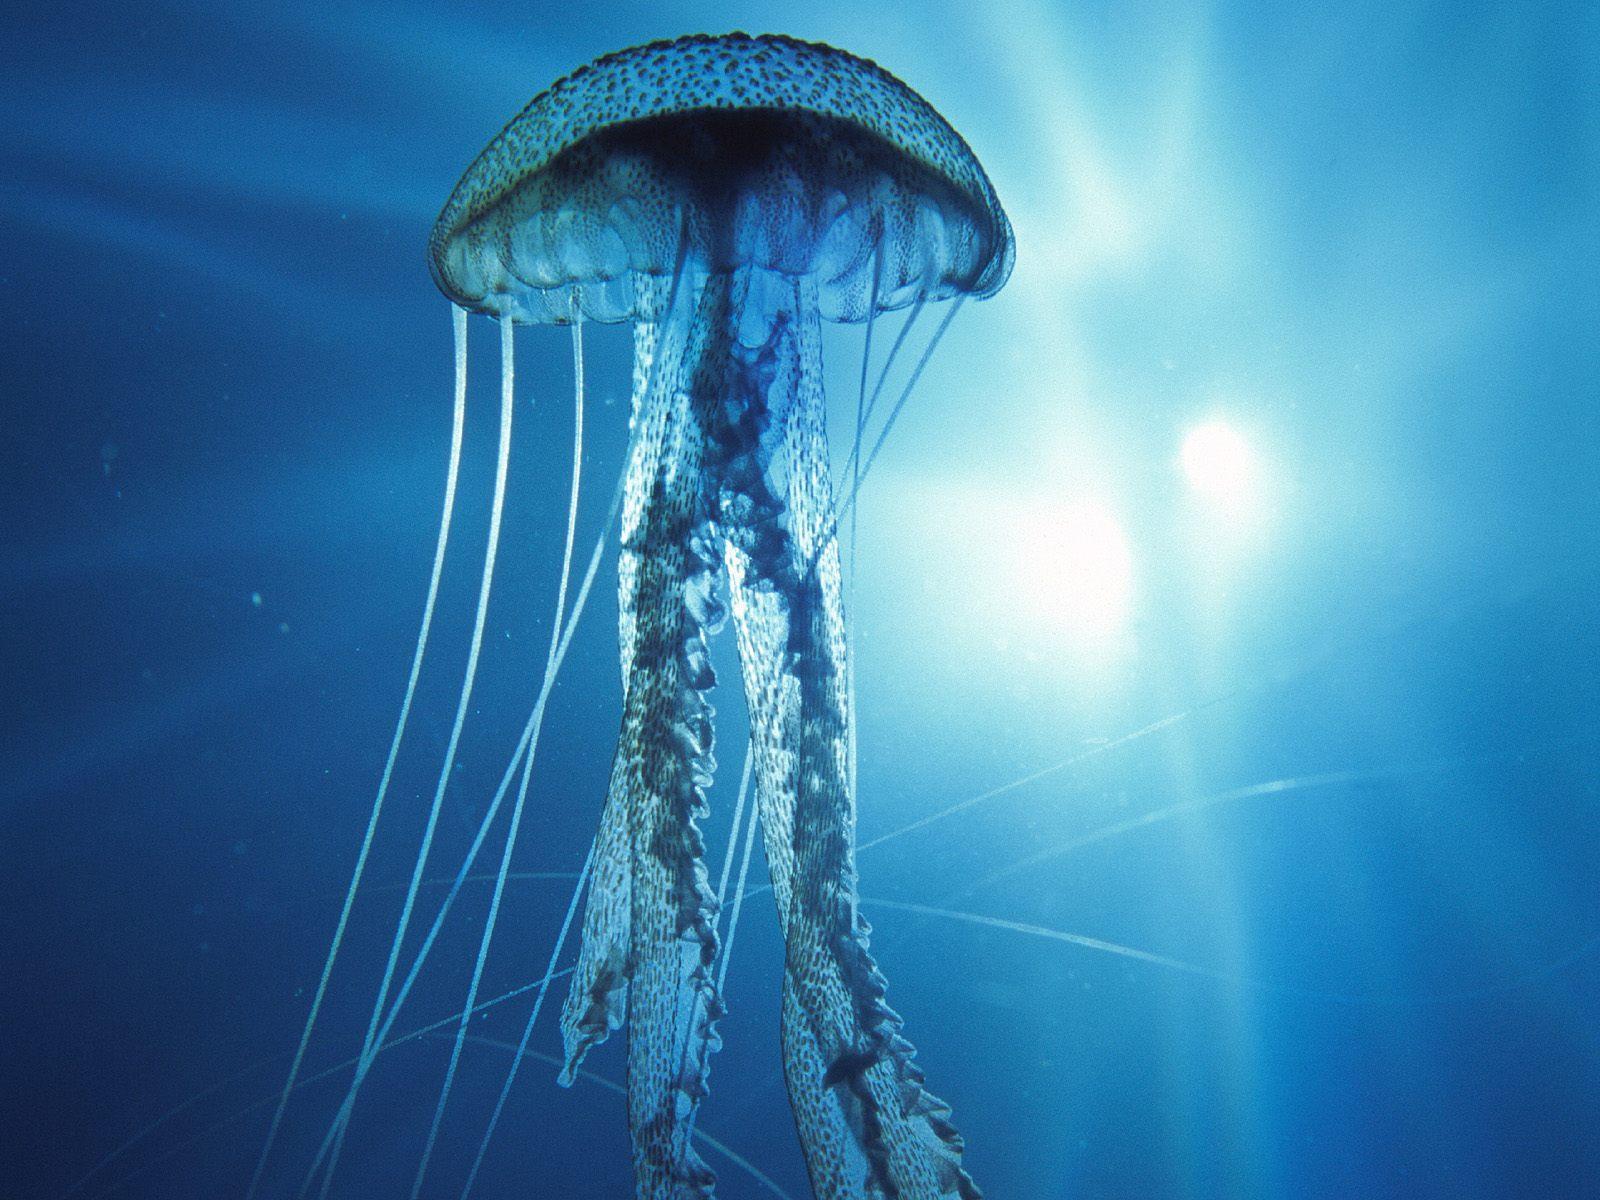 large_meduse-1462872168.jpg